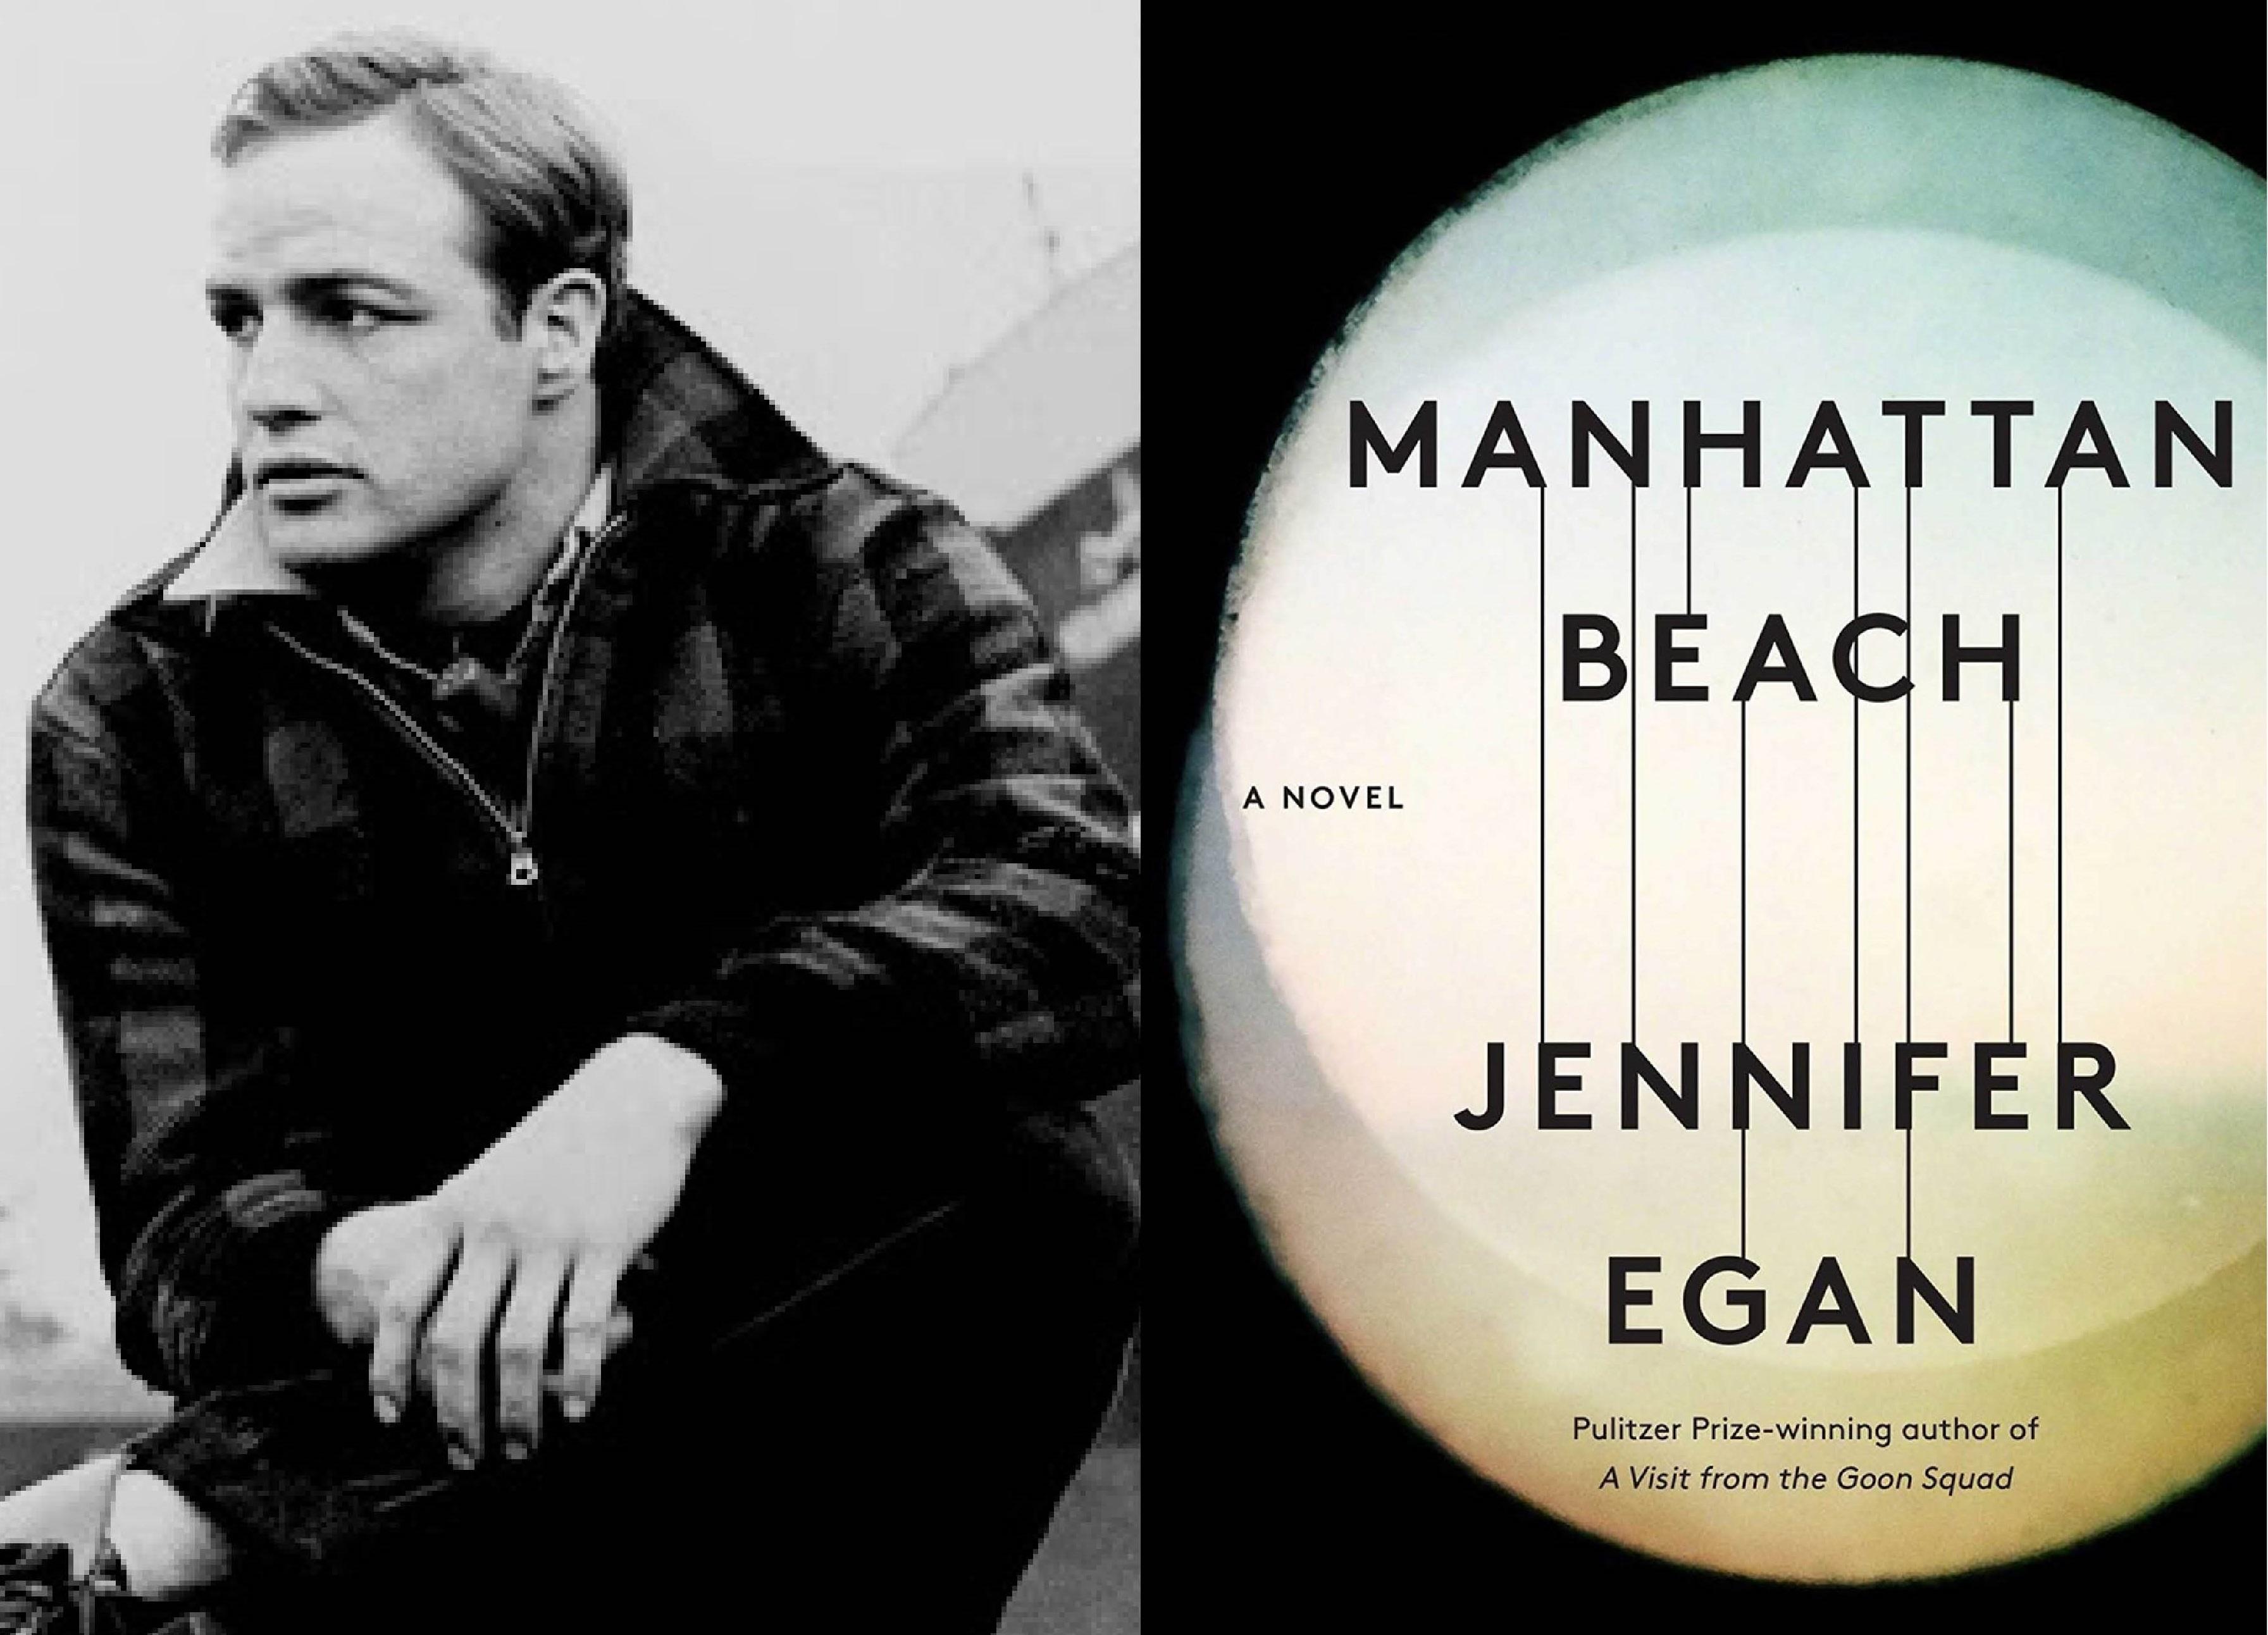 Marlon Brando in On the Waterfront; Manhattan Beach by Jennifer Egan book cover